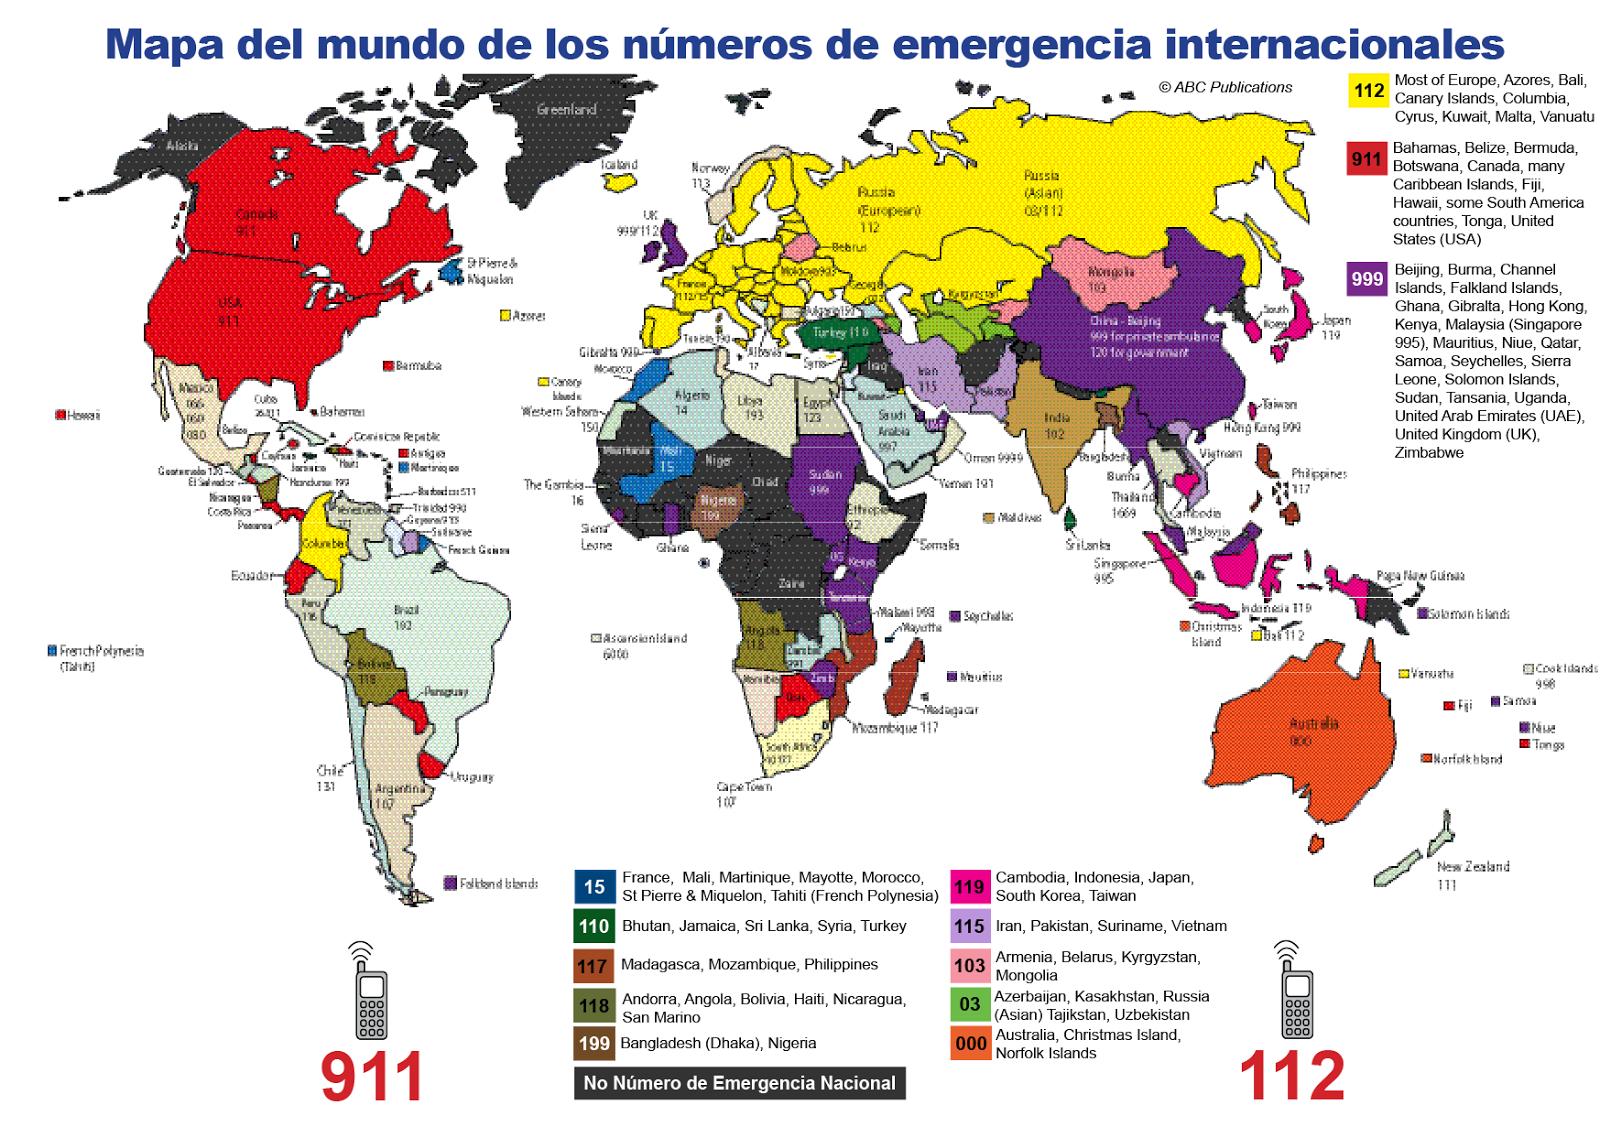 Worldwide Emergency Numbers